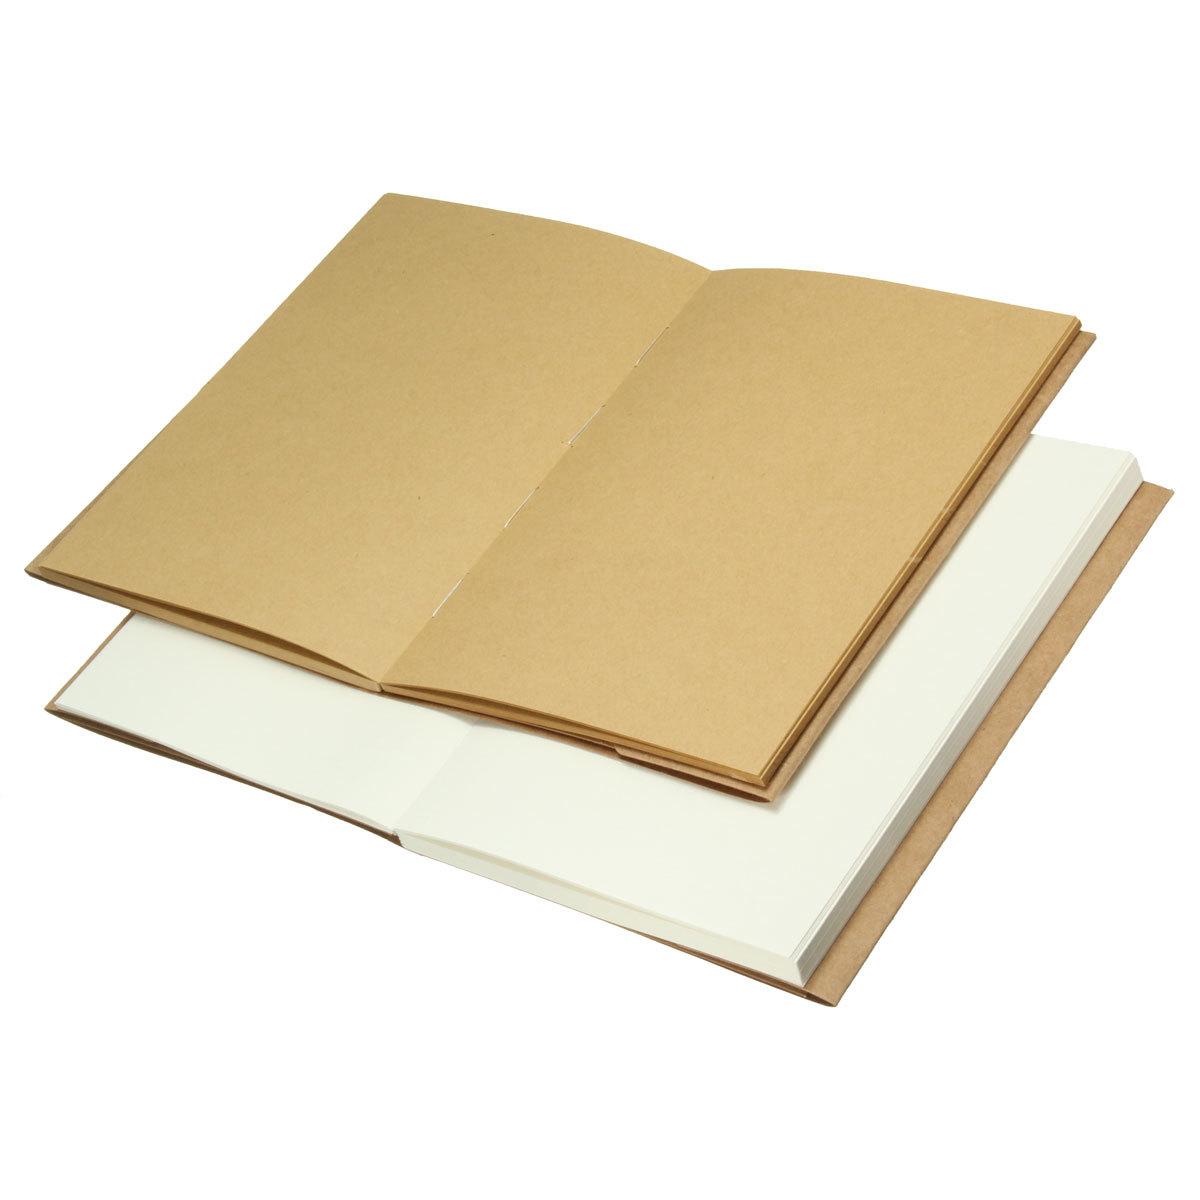 Retro Vintage Kraft Cover Blank White Paper Sketchbook Journal Diary Uchii Paket Buku Memo Notebook A5 Craft Dan Pensil Mekanik Kayu 32k Inside Page Back Sketching Note Book